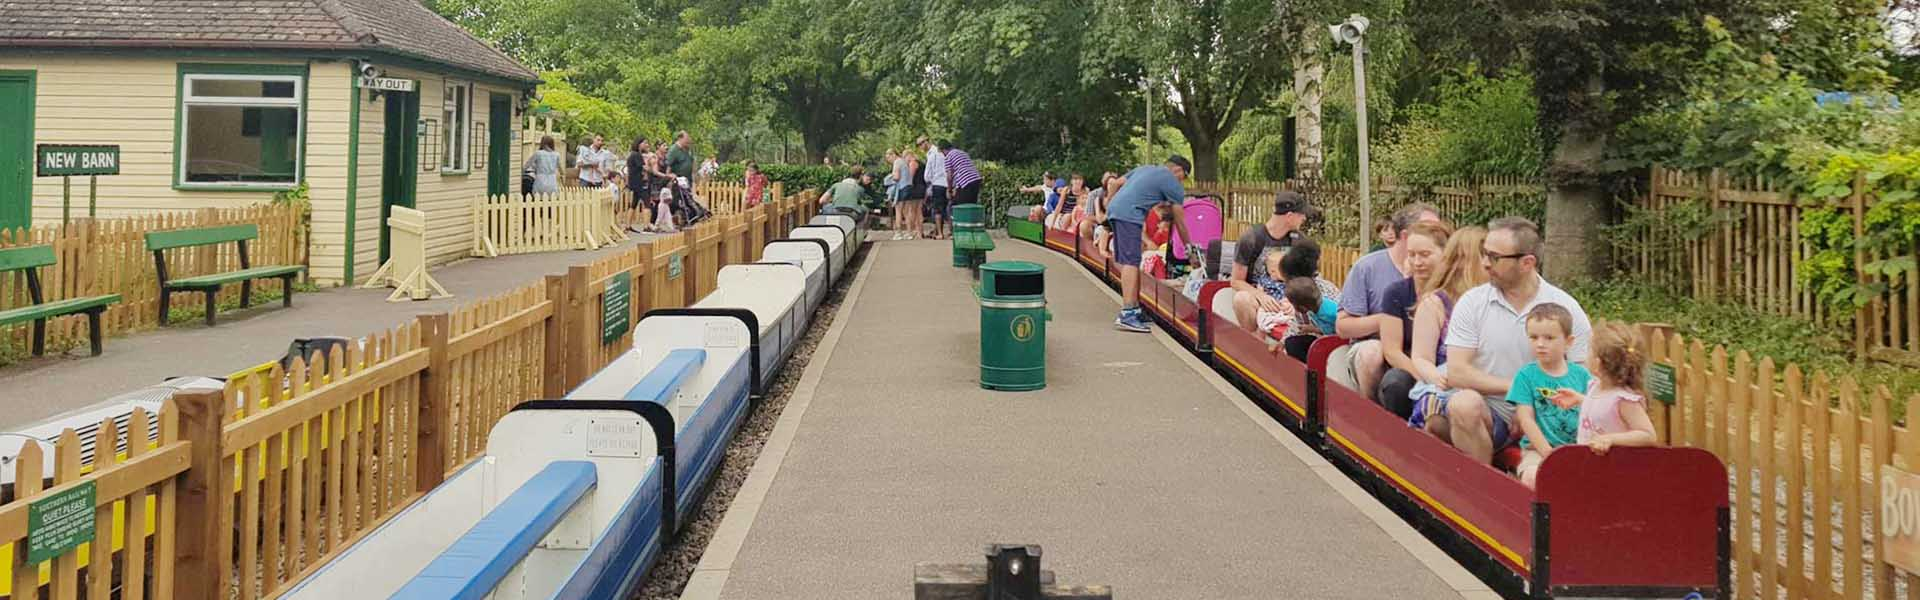 New Barn Station, miniturerailway at Swanley Park